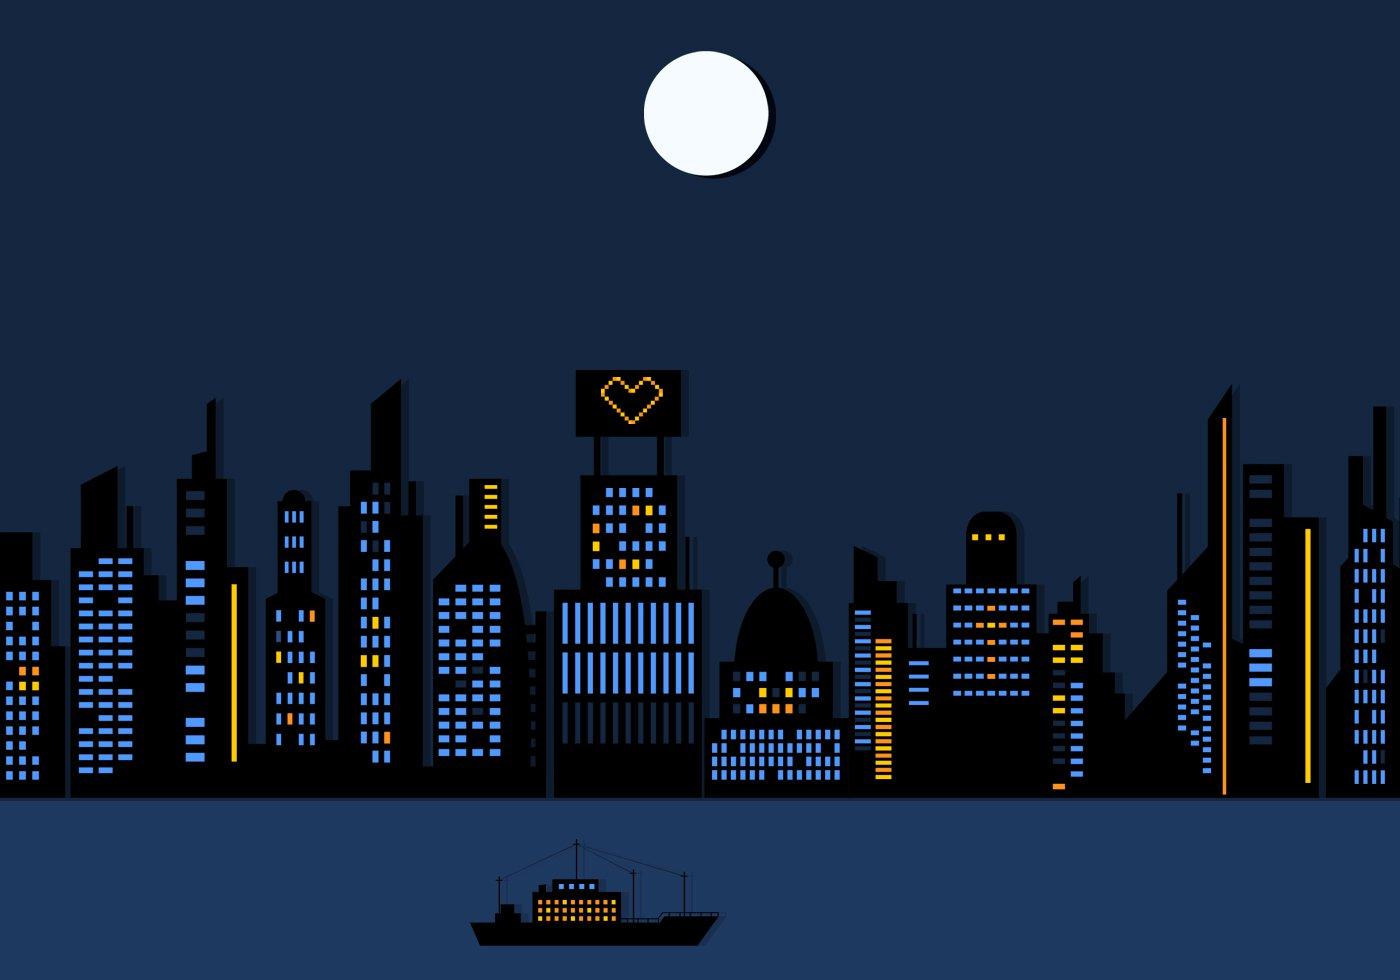 Night Time City Skyscraper Wallpaper Vector   Download Vector Art 1400x980